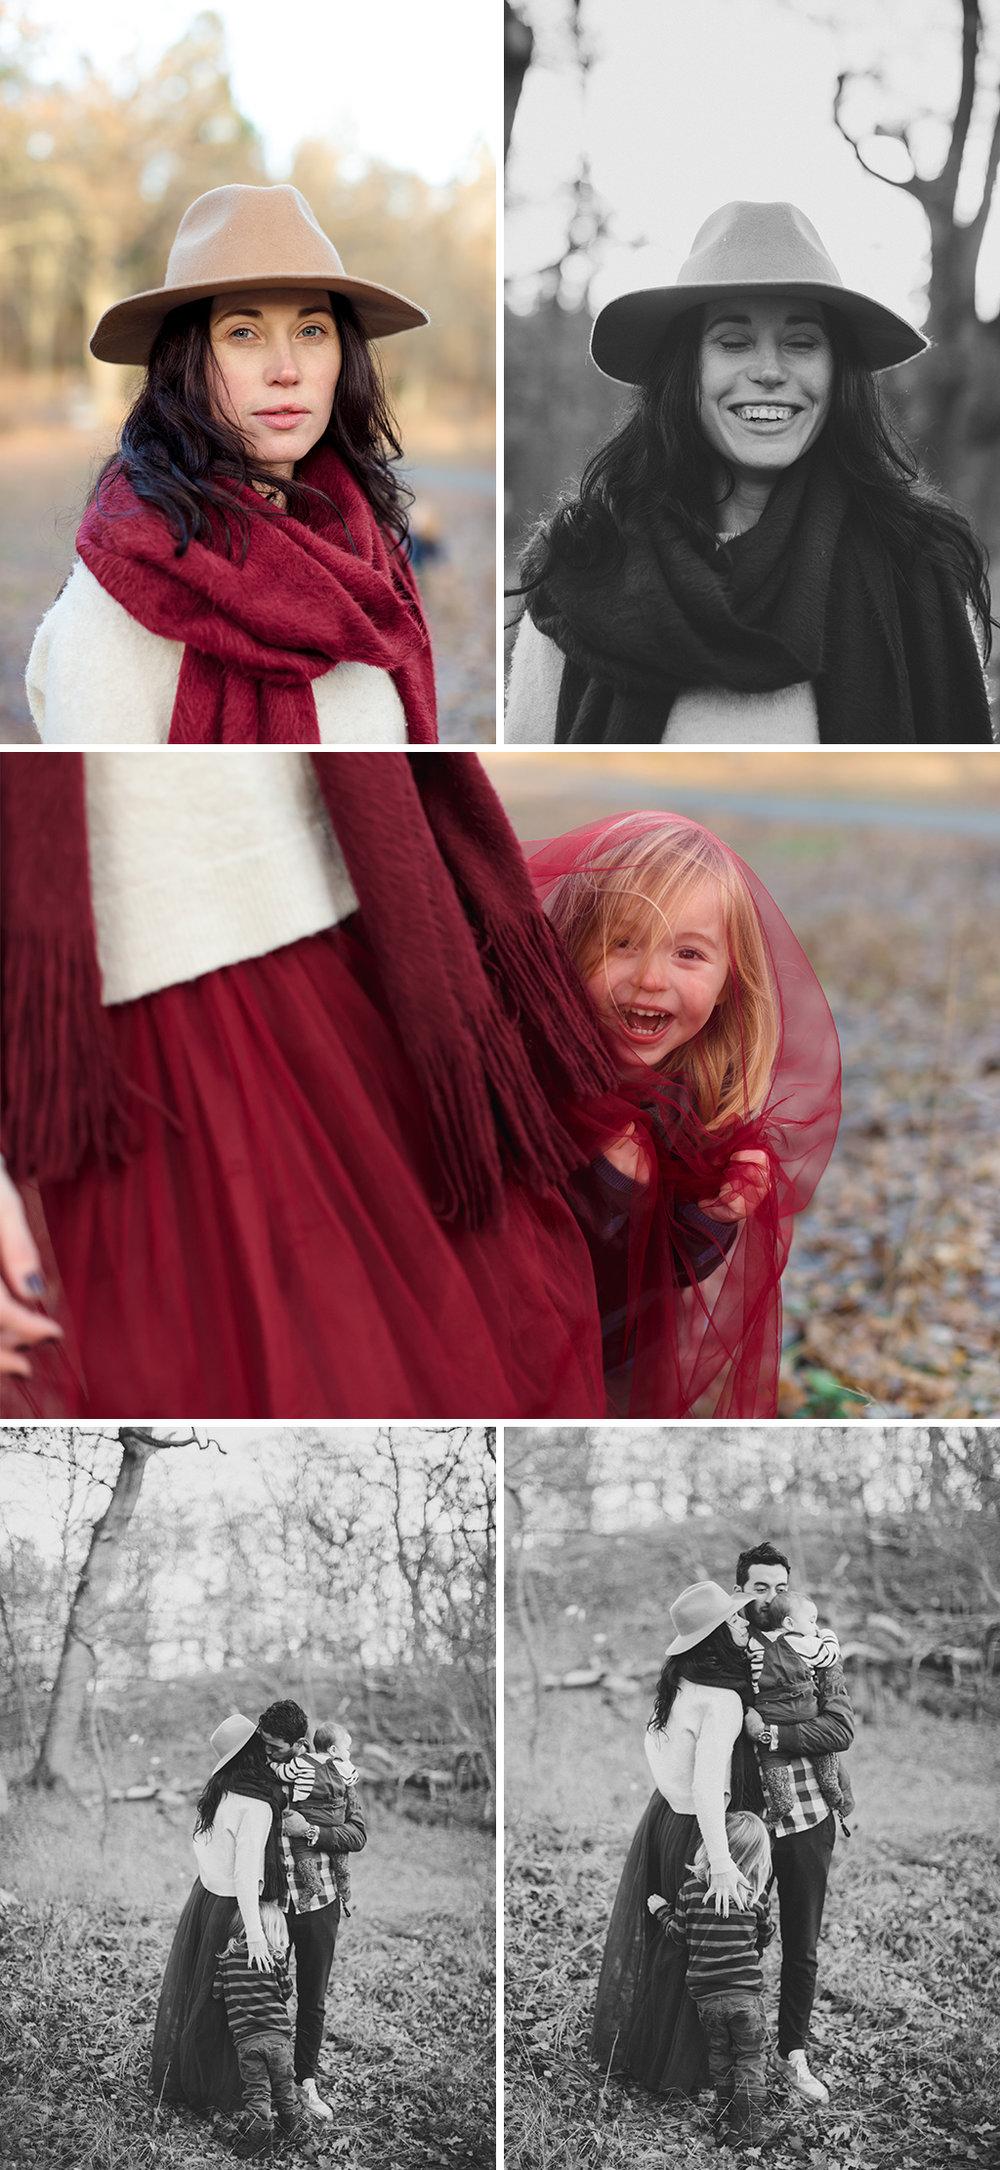 Hostfotografering-i-november-familjefotografering-Stockholm-7.jpg